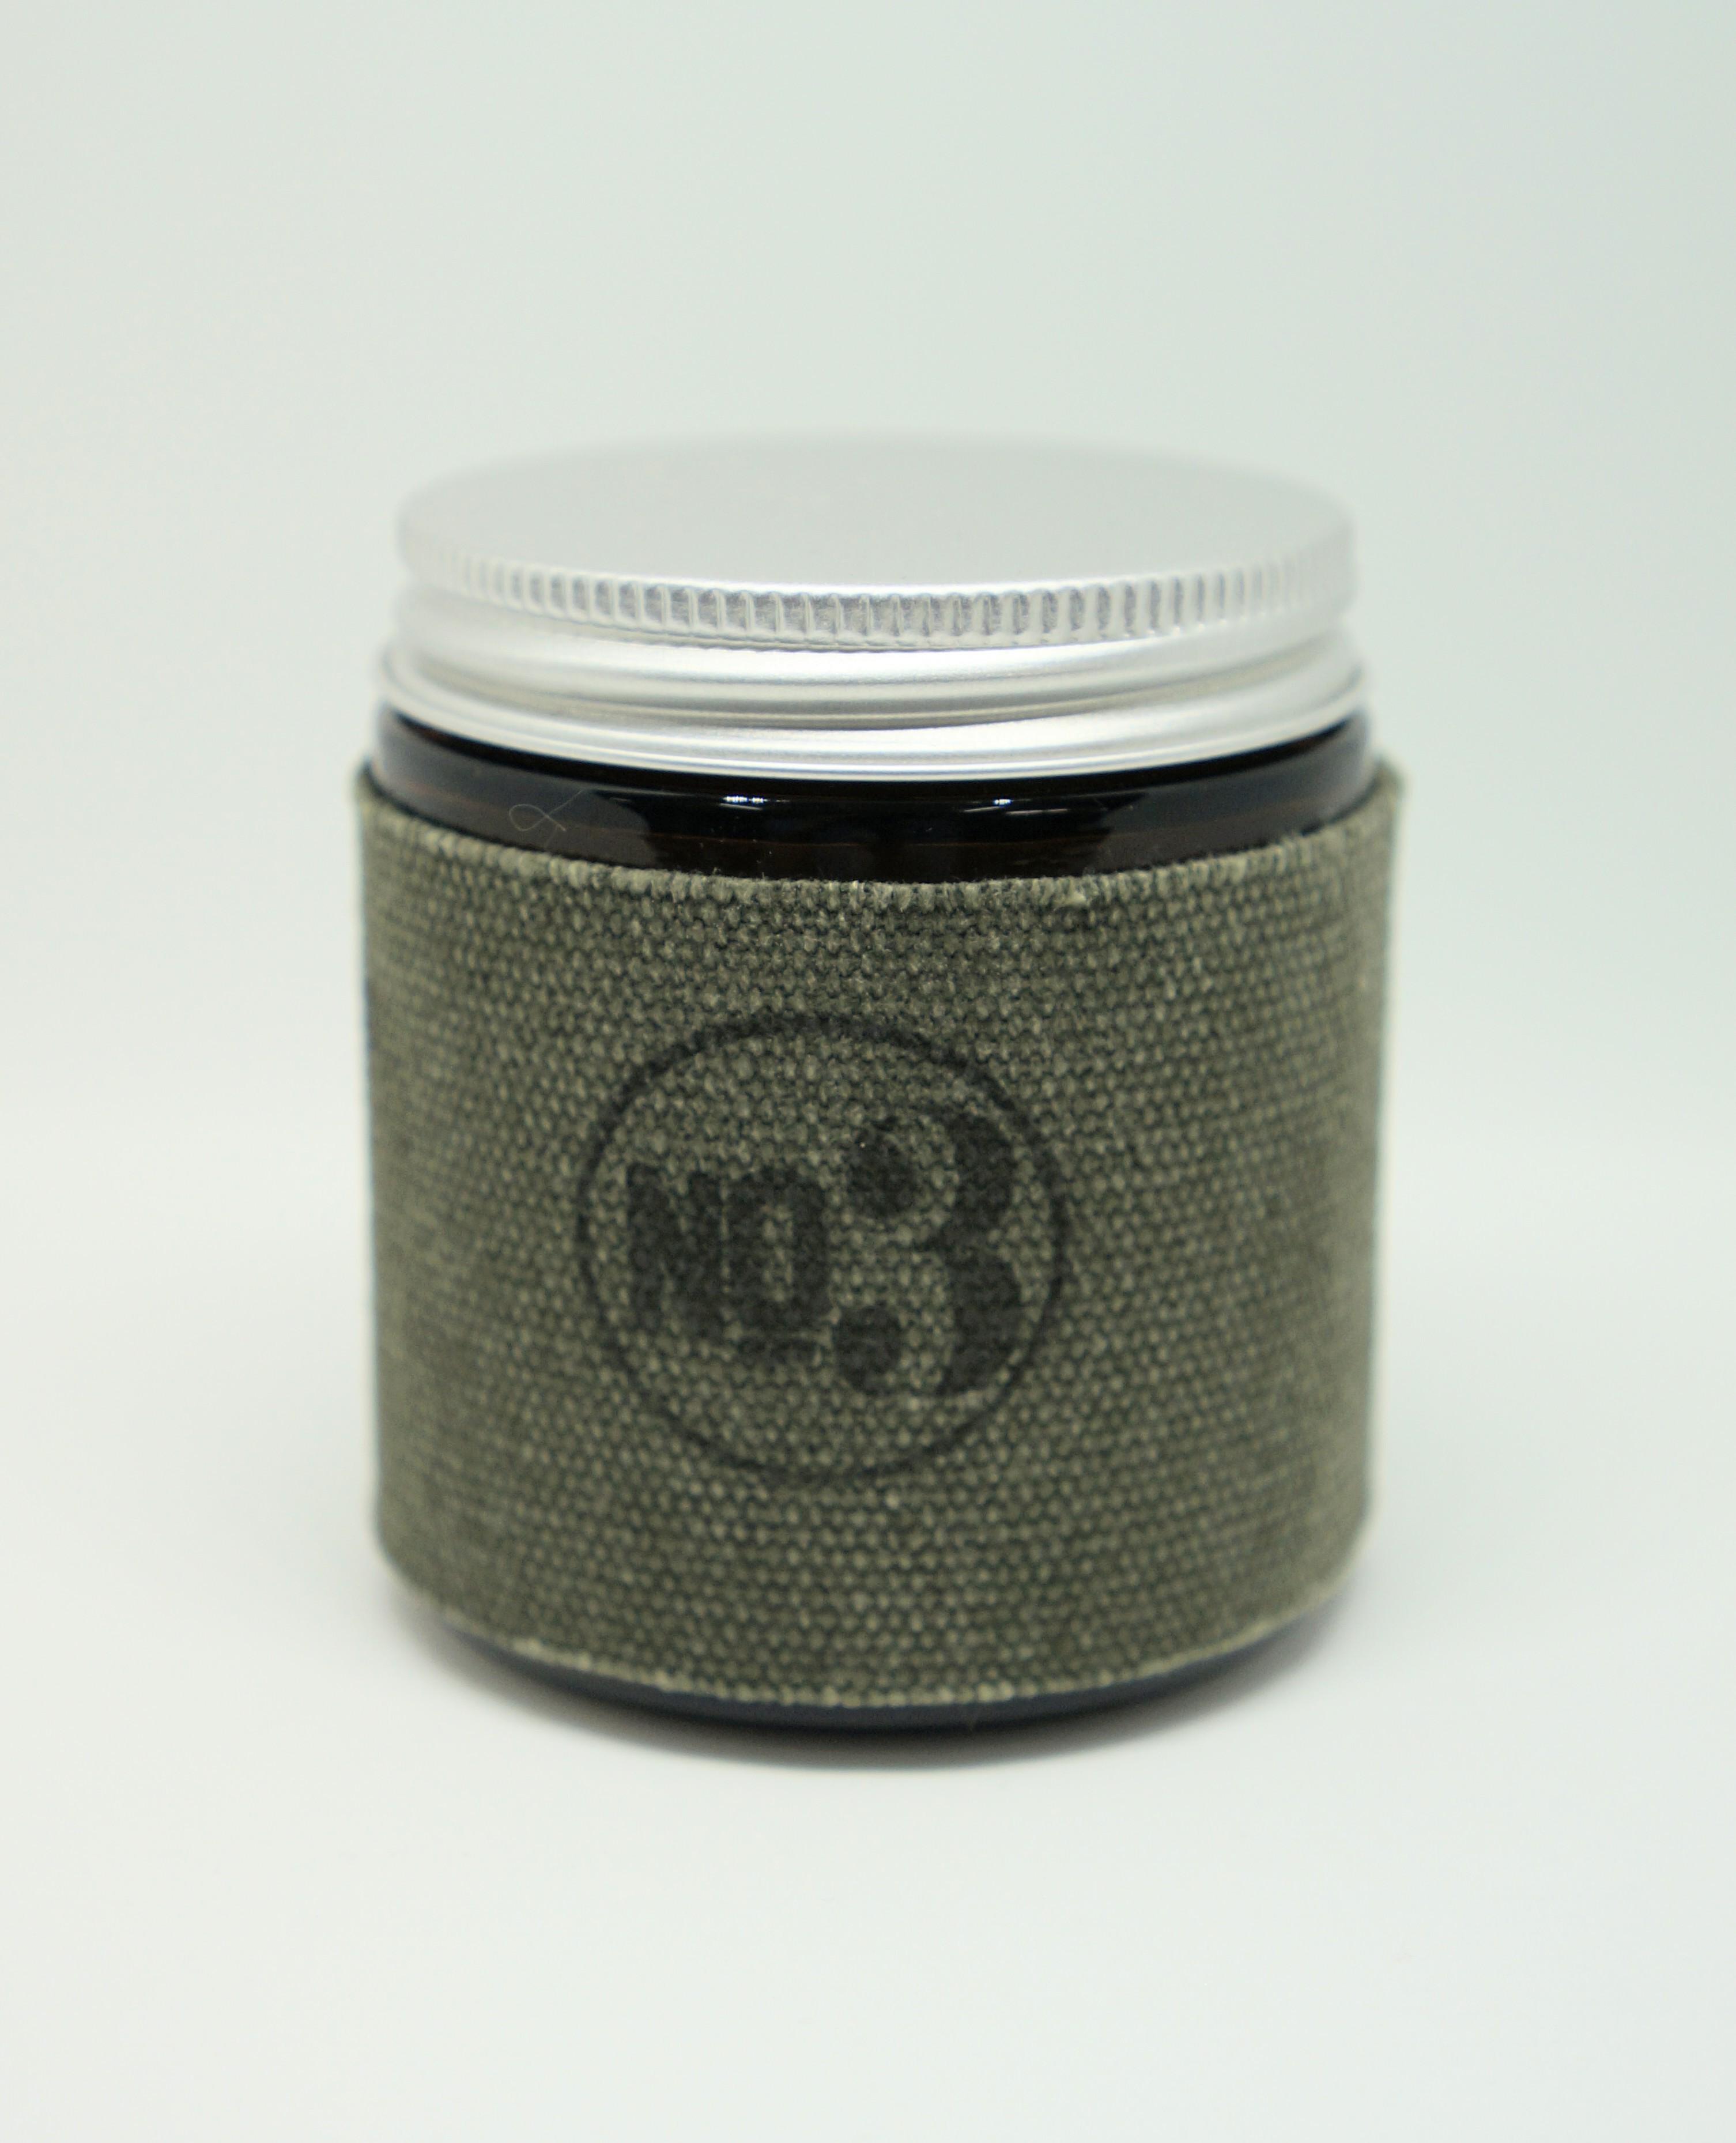 4oz Amber Jar Candle -JASMINE AND SEA SALT- キャンドル Candles - 画像2